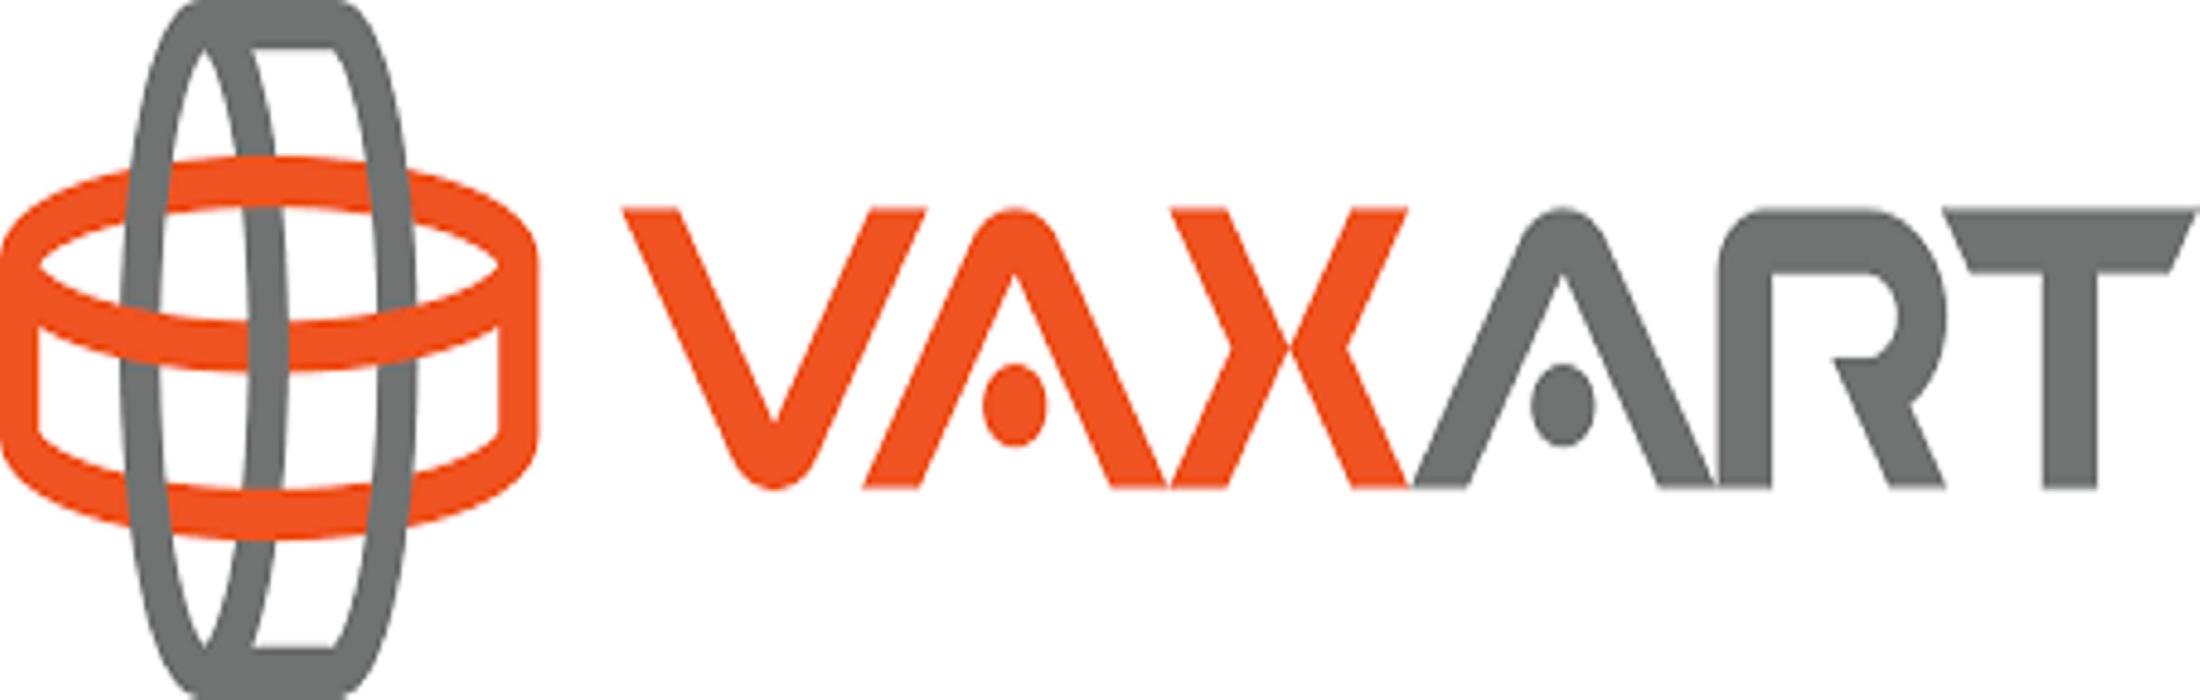 VXRT logo